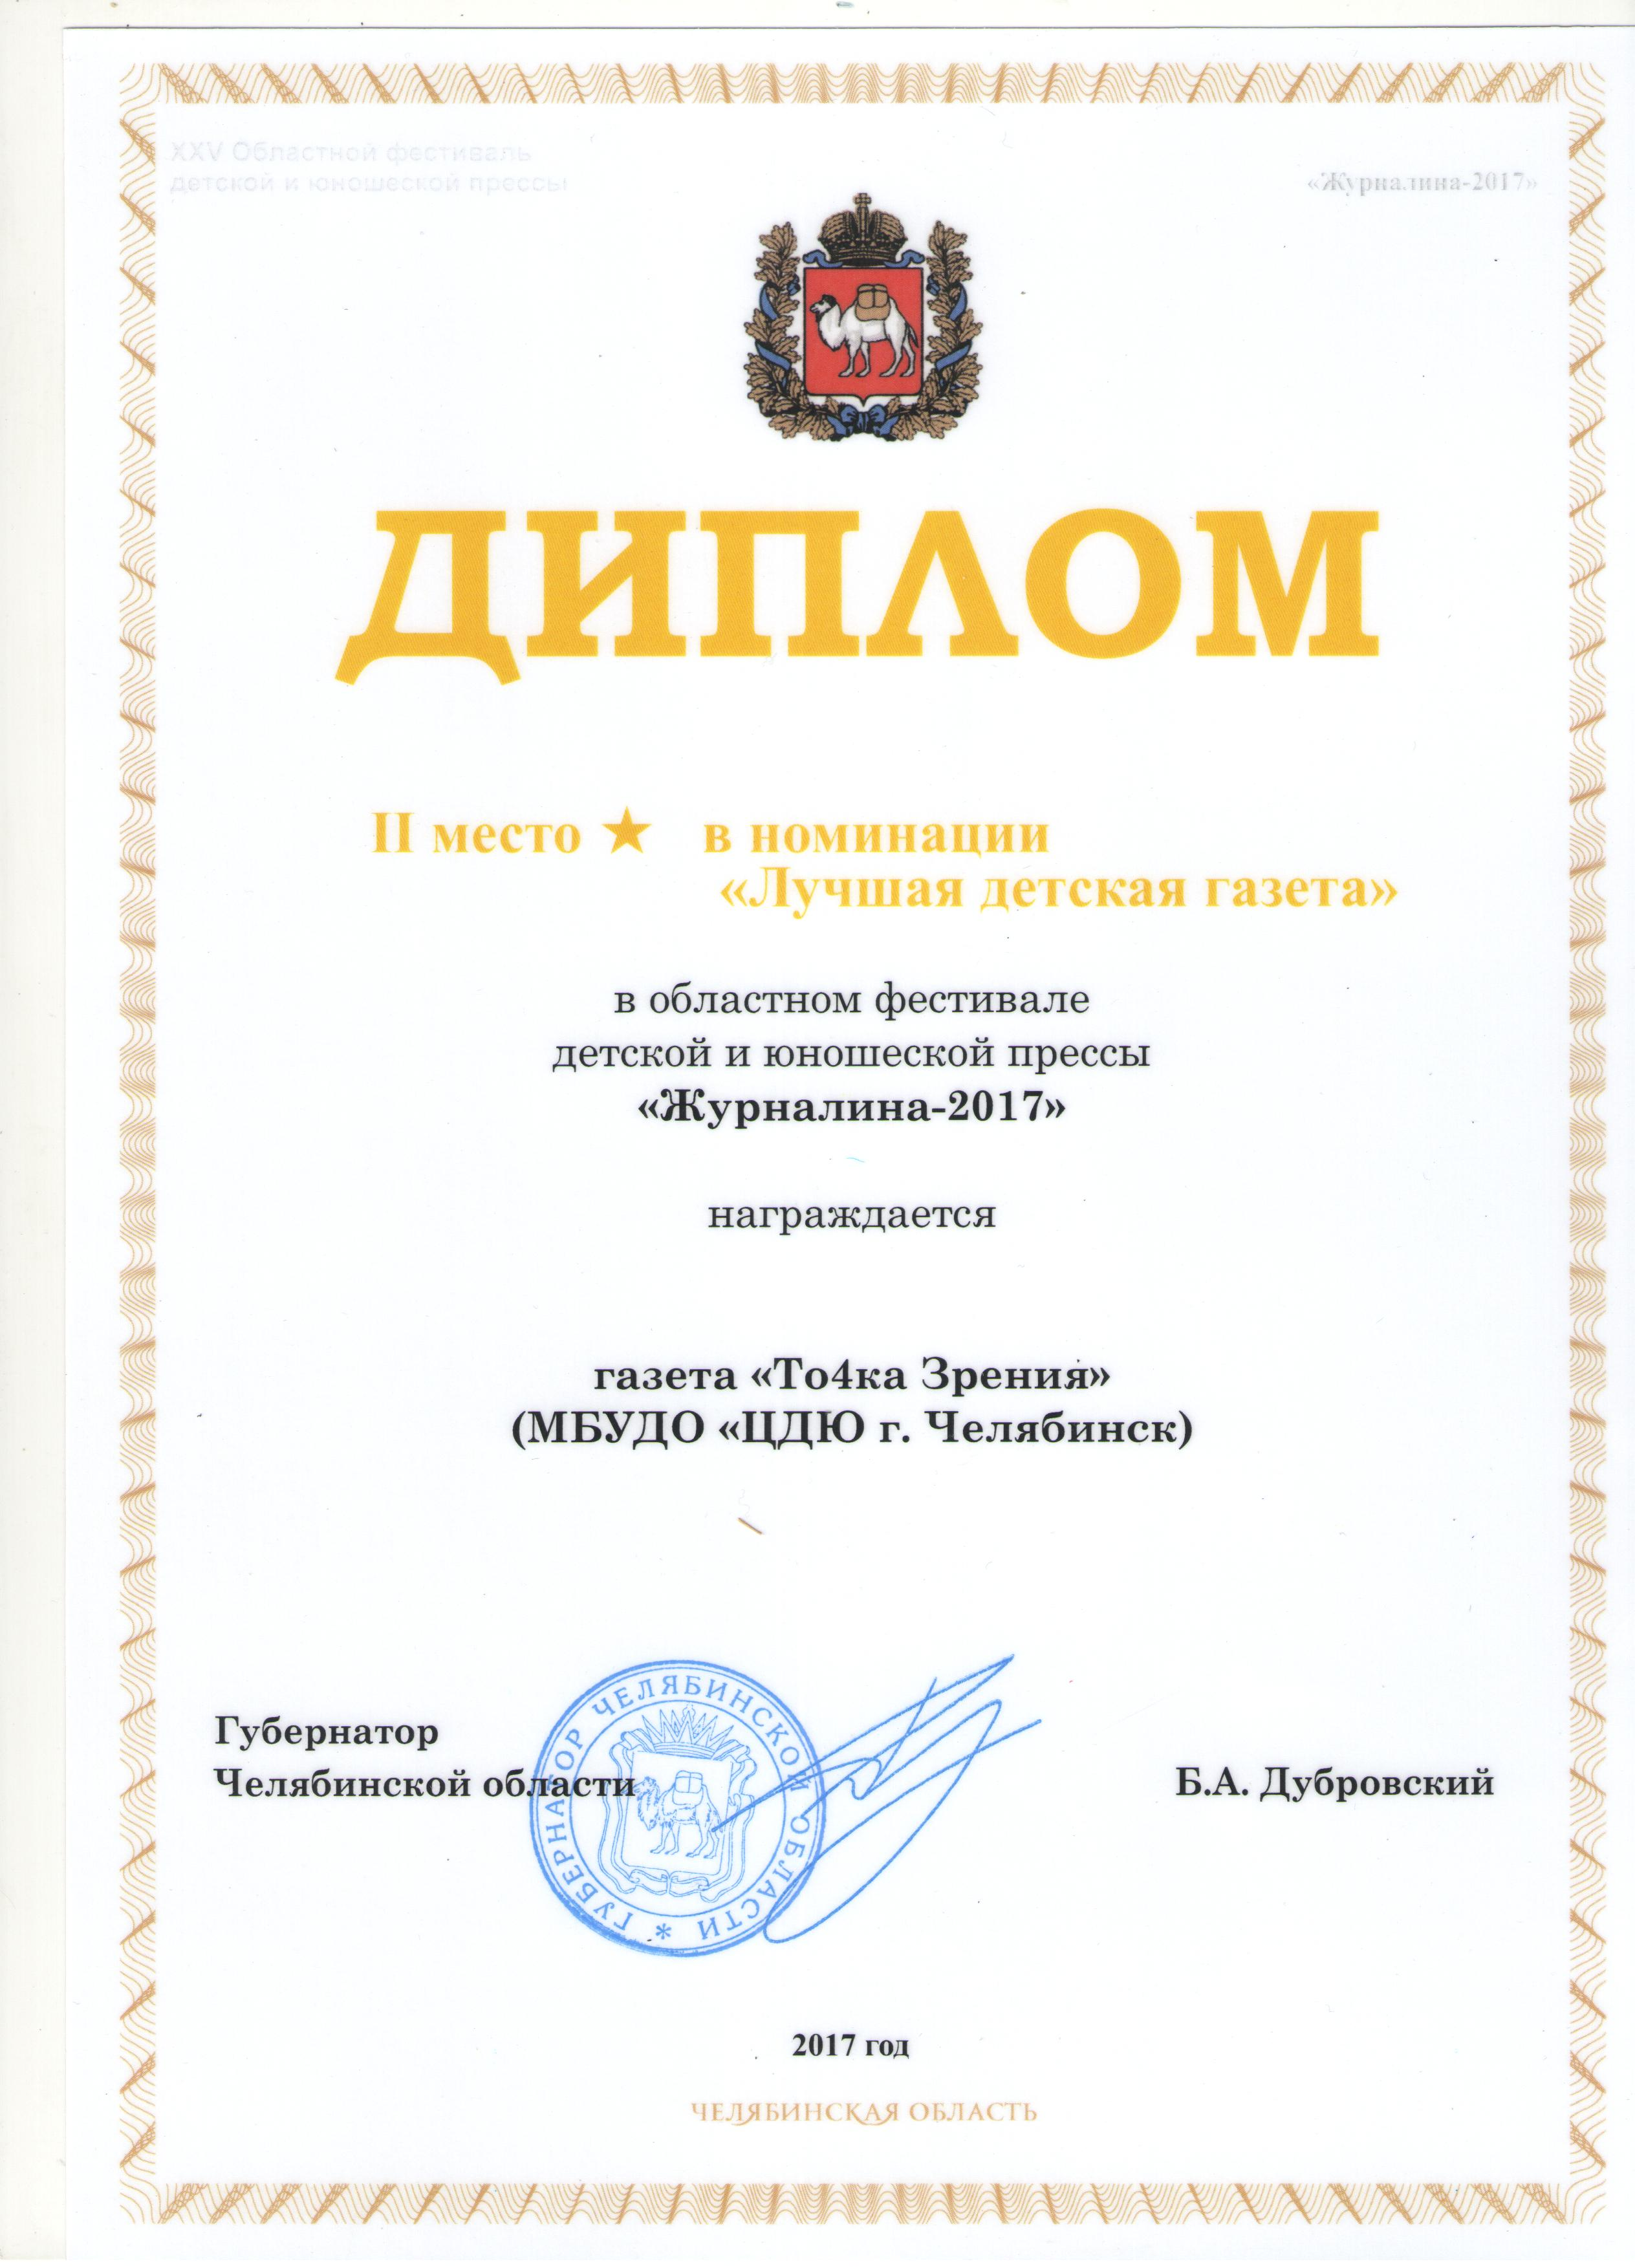 zhurnalina-2017-4